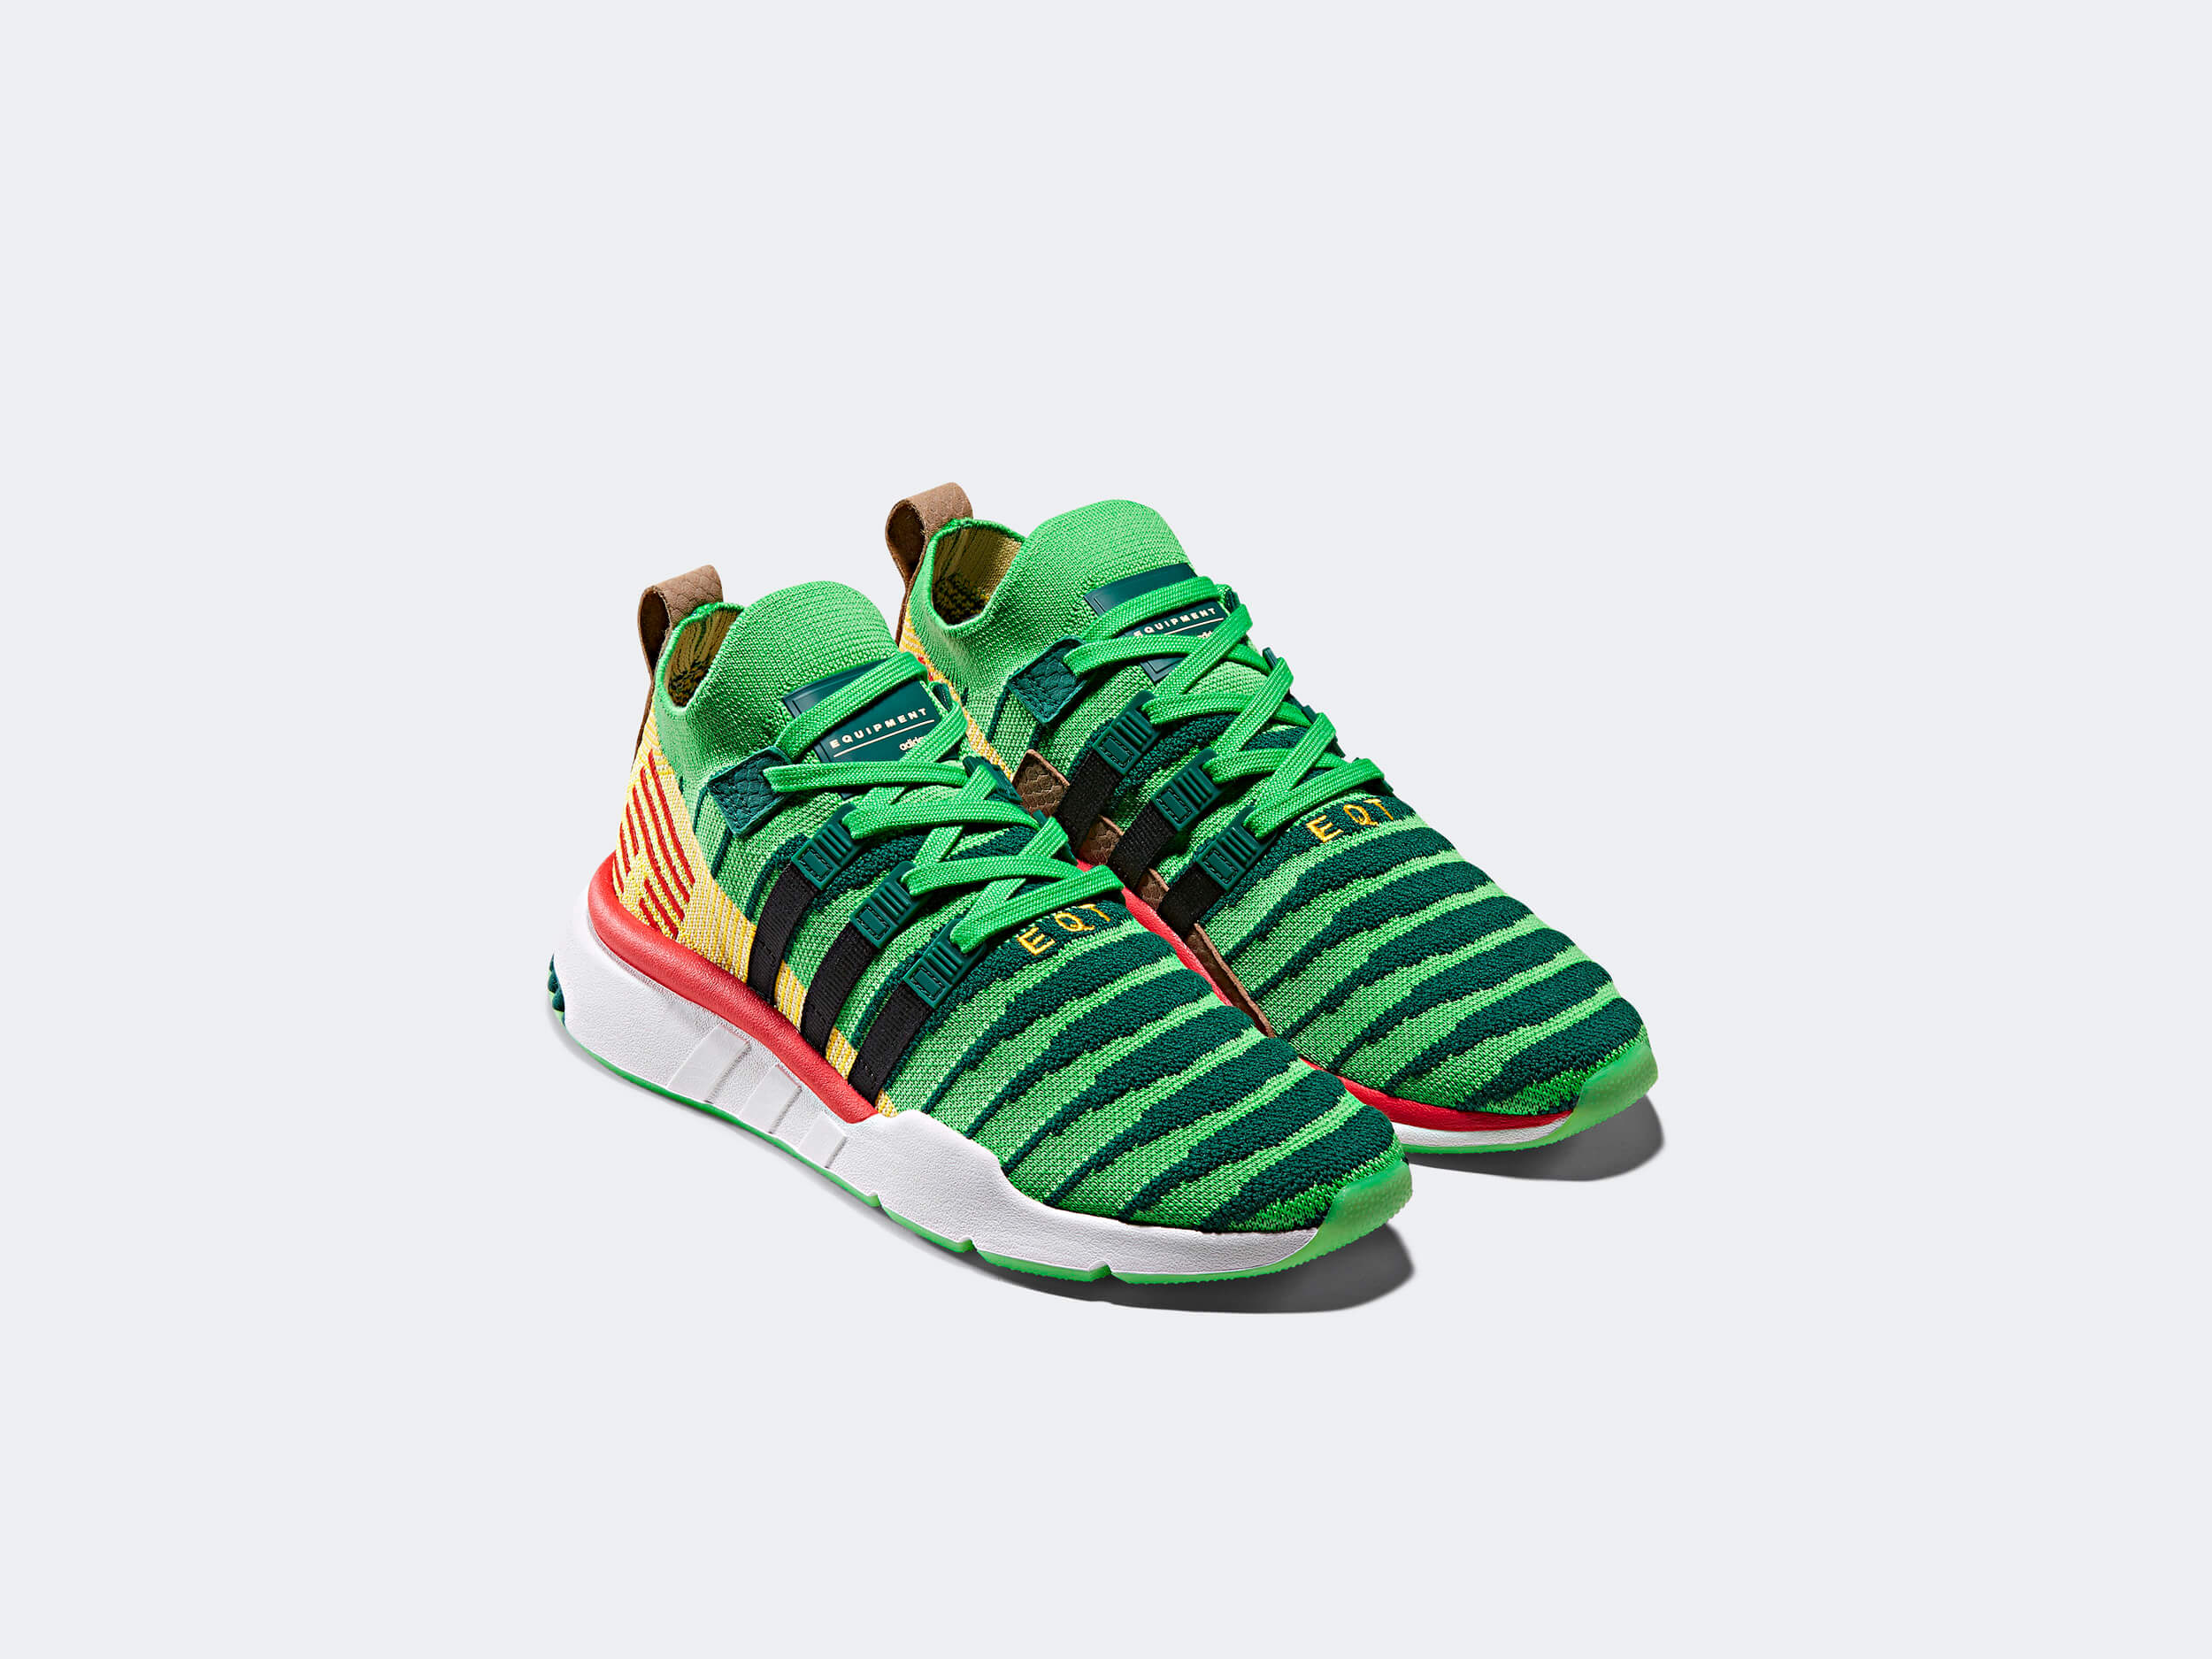 「adidas Originals by Dragonball Z《七龍珠Z》」系列7款鞋全登場! 七龍珠、運動鞋、